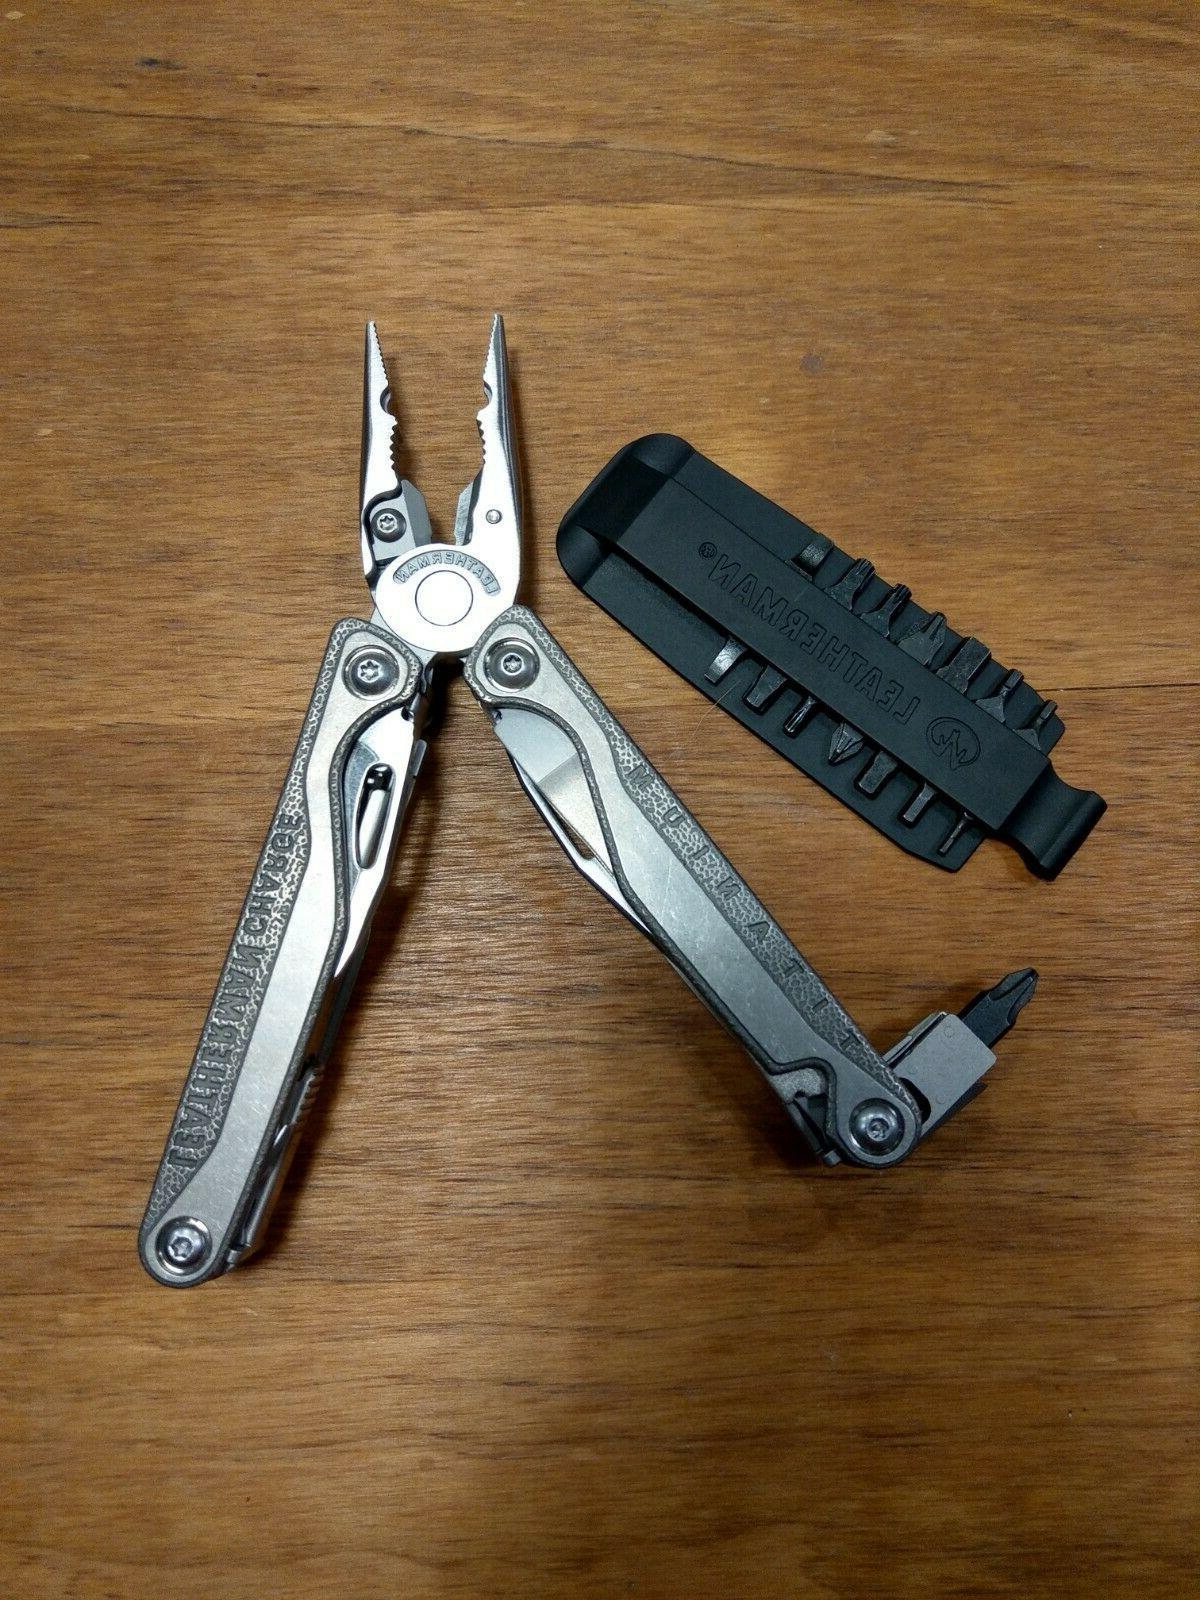 Survival +TTI - Multi Tools, 832528 in PB Packing